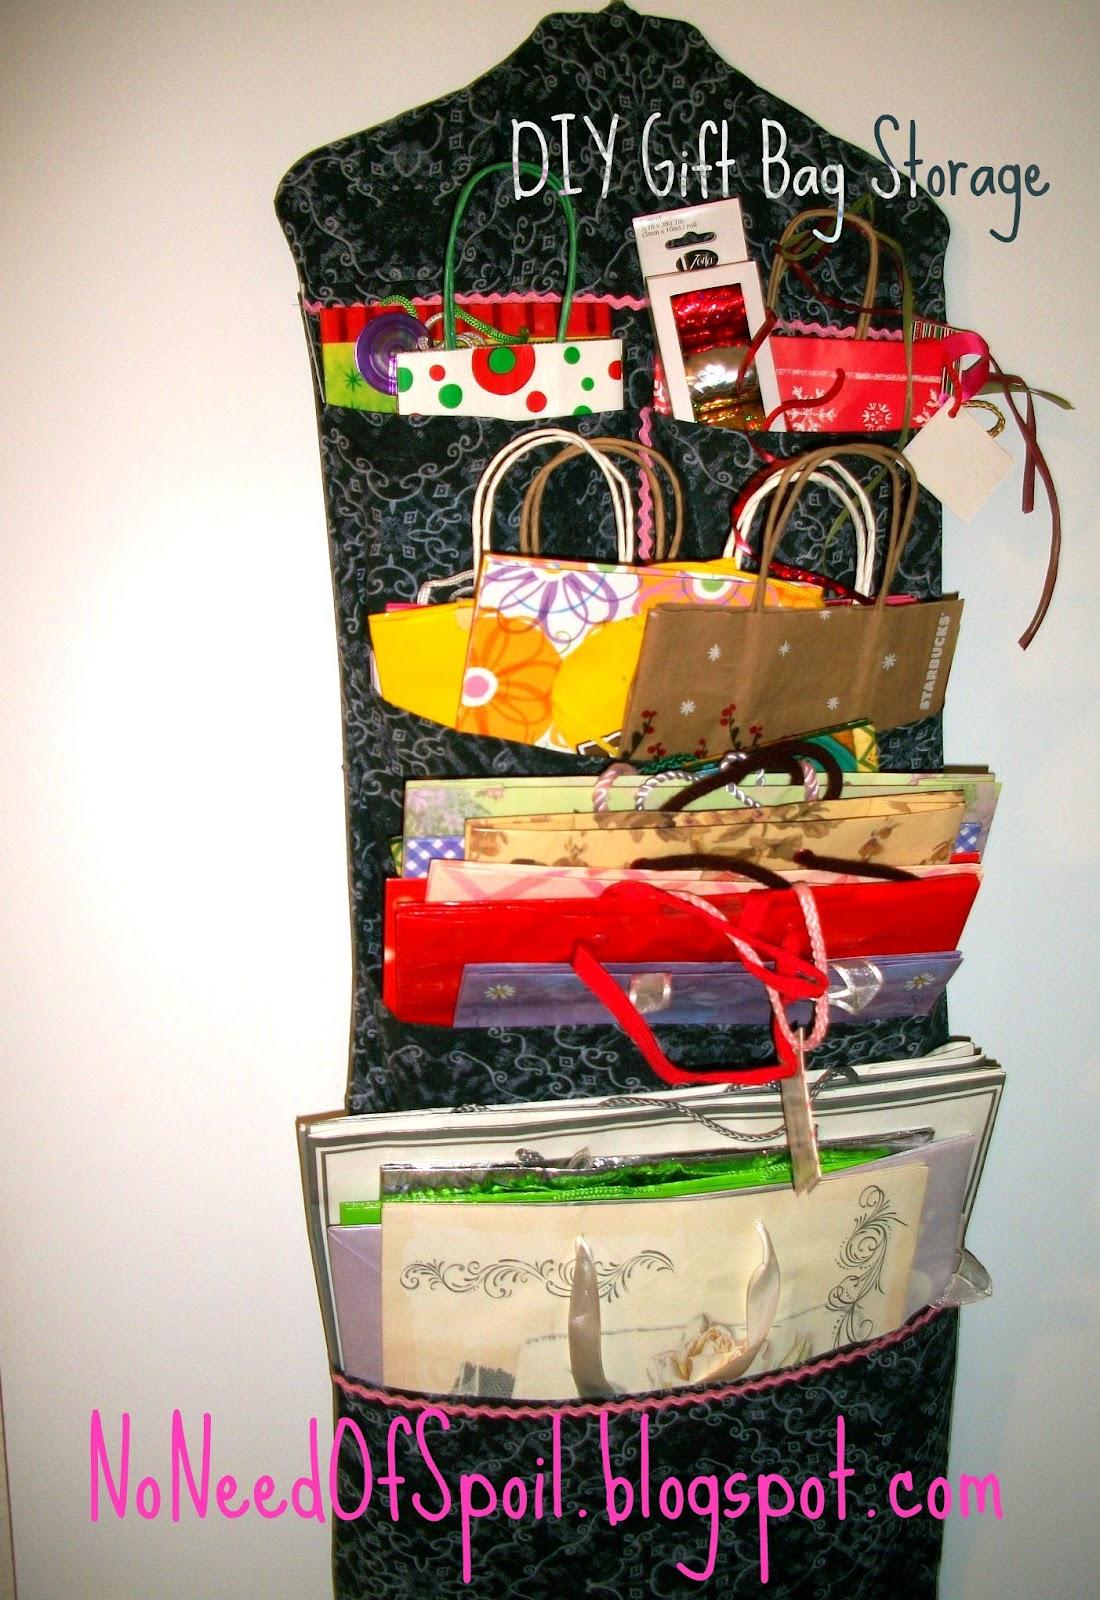 DIY Gift Bag Storage Tutorial & No Need Of Spoil: DIY Gift Bag Storage Tutorial